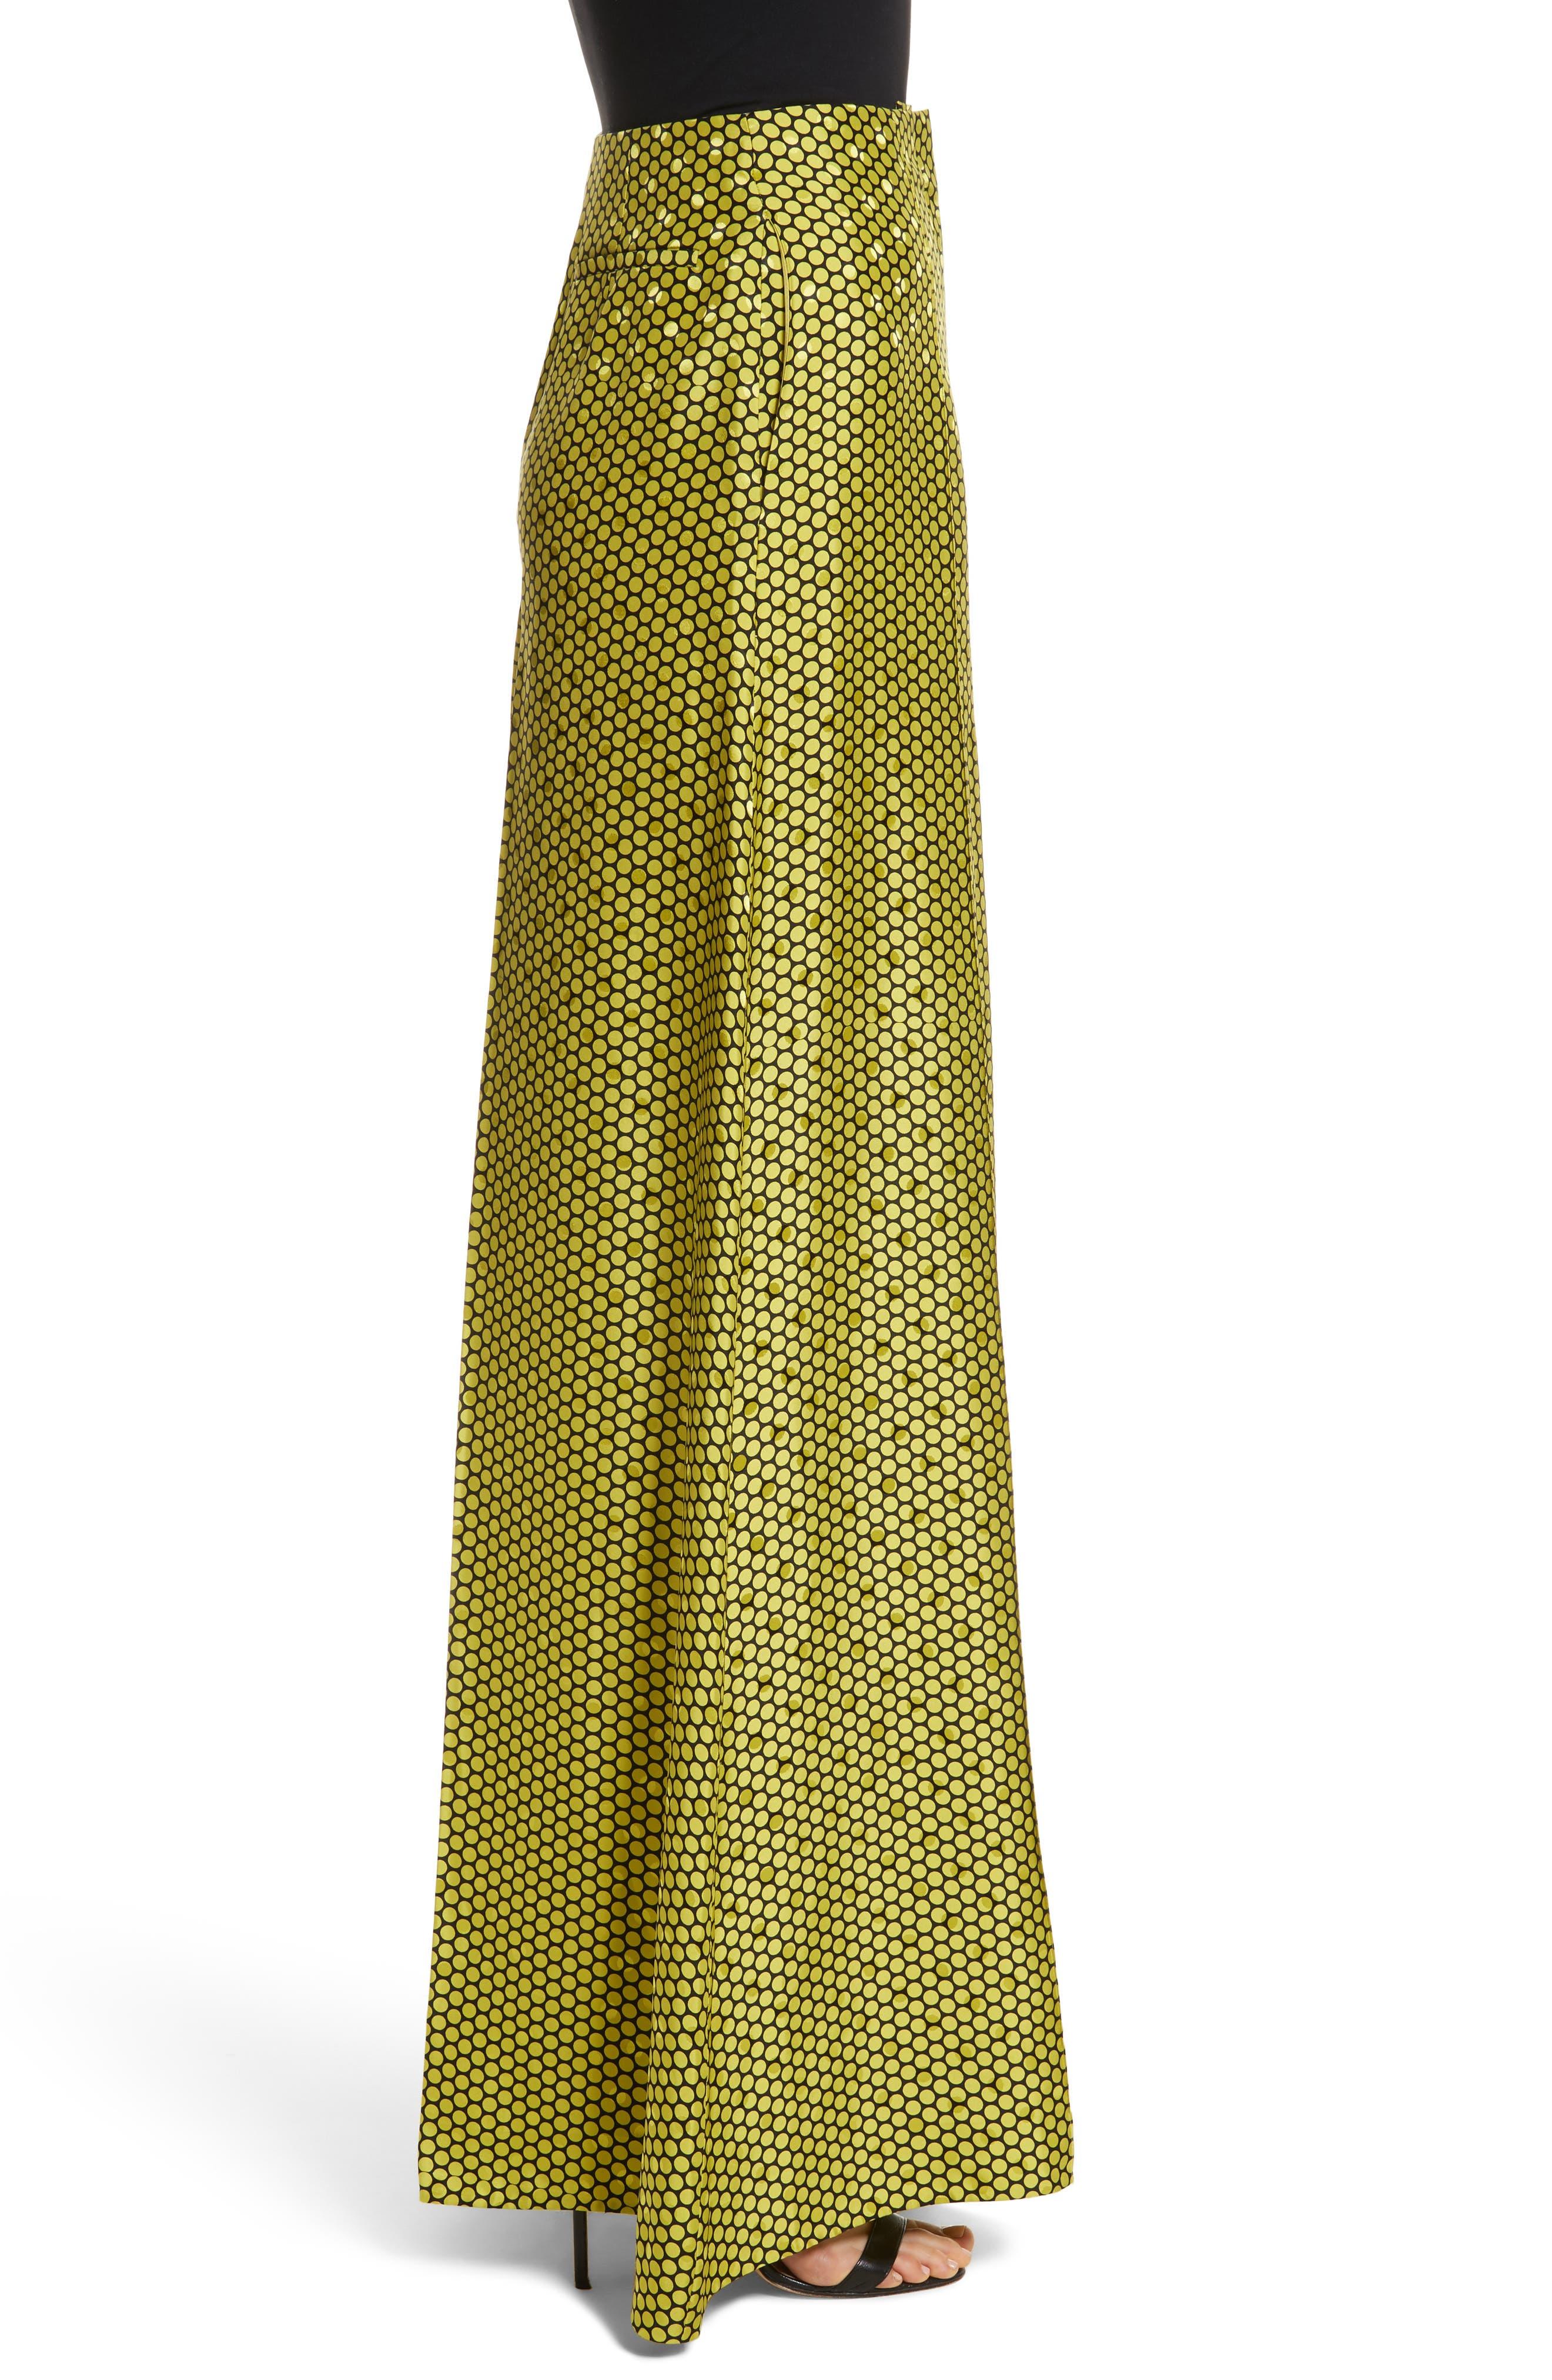 Diane von Furstenberg Dot Silk Palazzo Pants,                             Alternate thumbnail 3, color,                             390